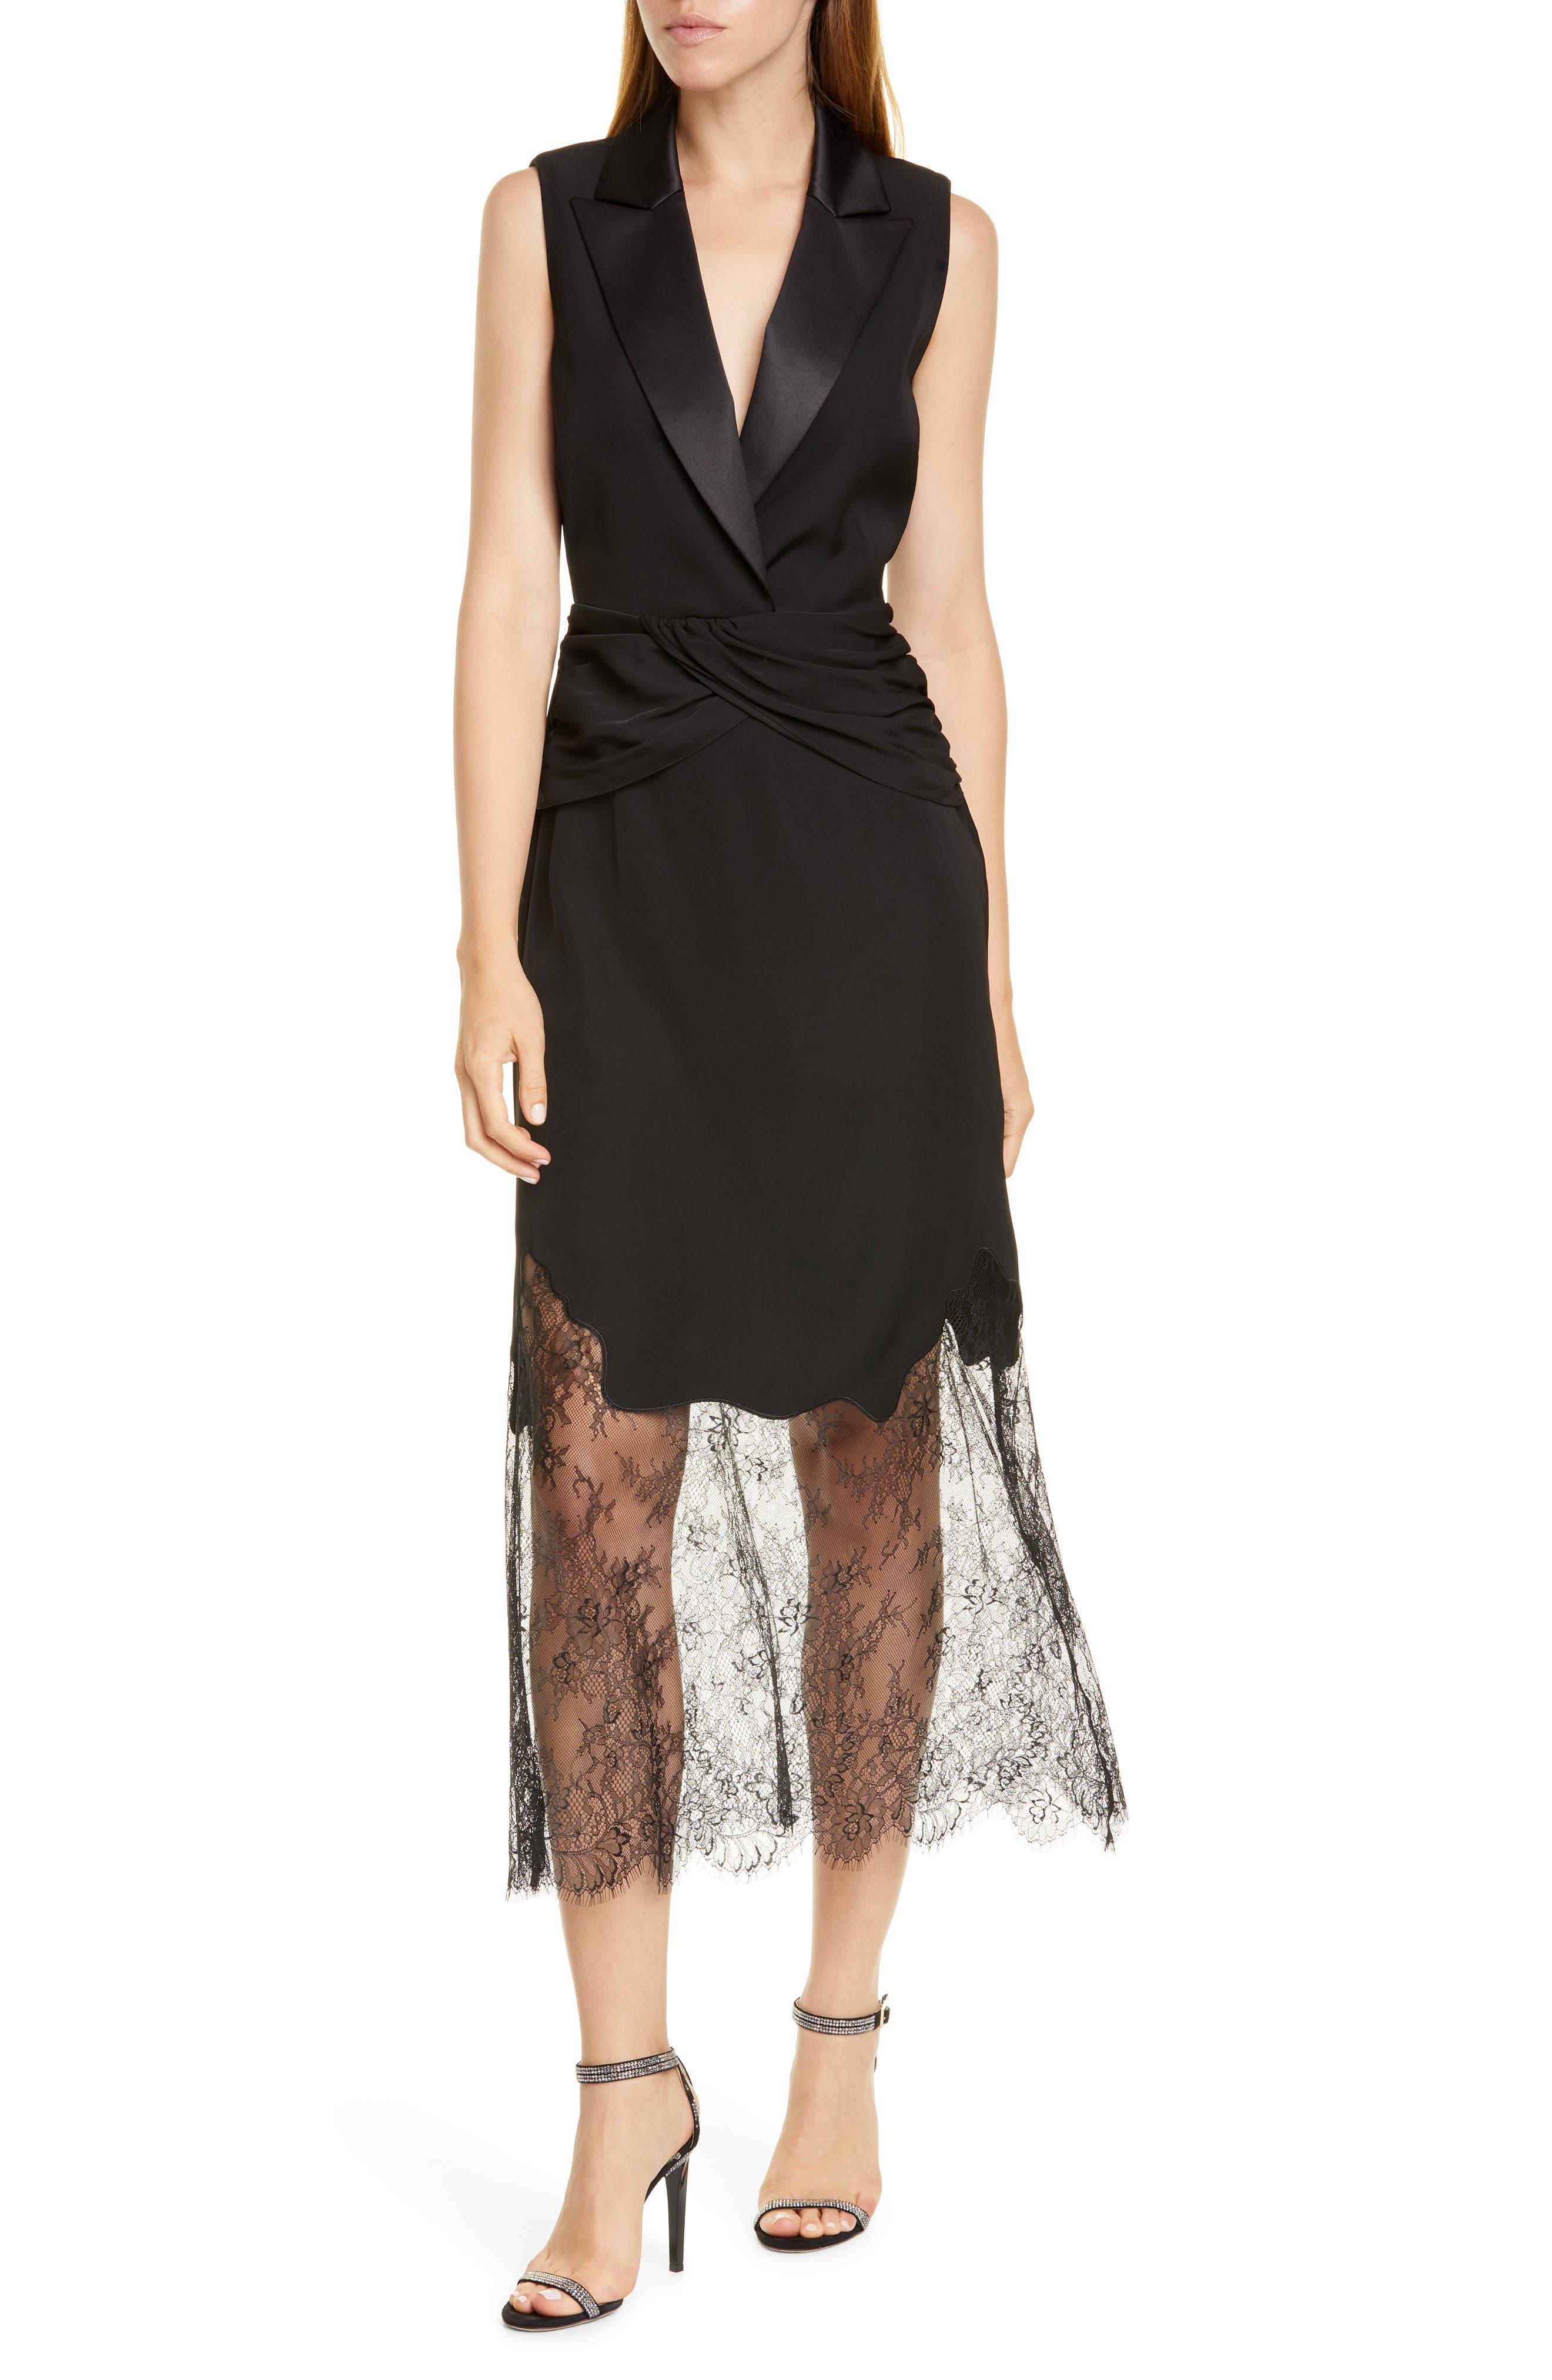 Self-Portrait Dresses Sleeveless Lace Midi Dress